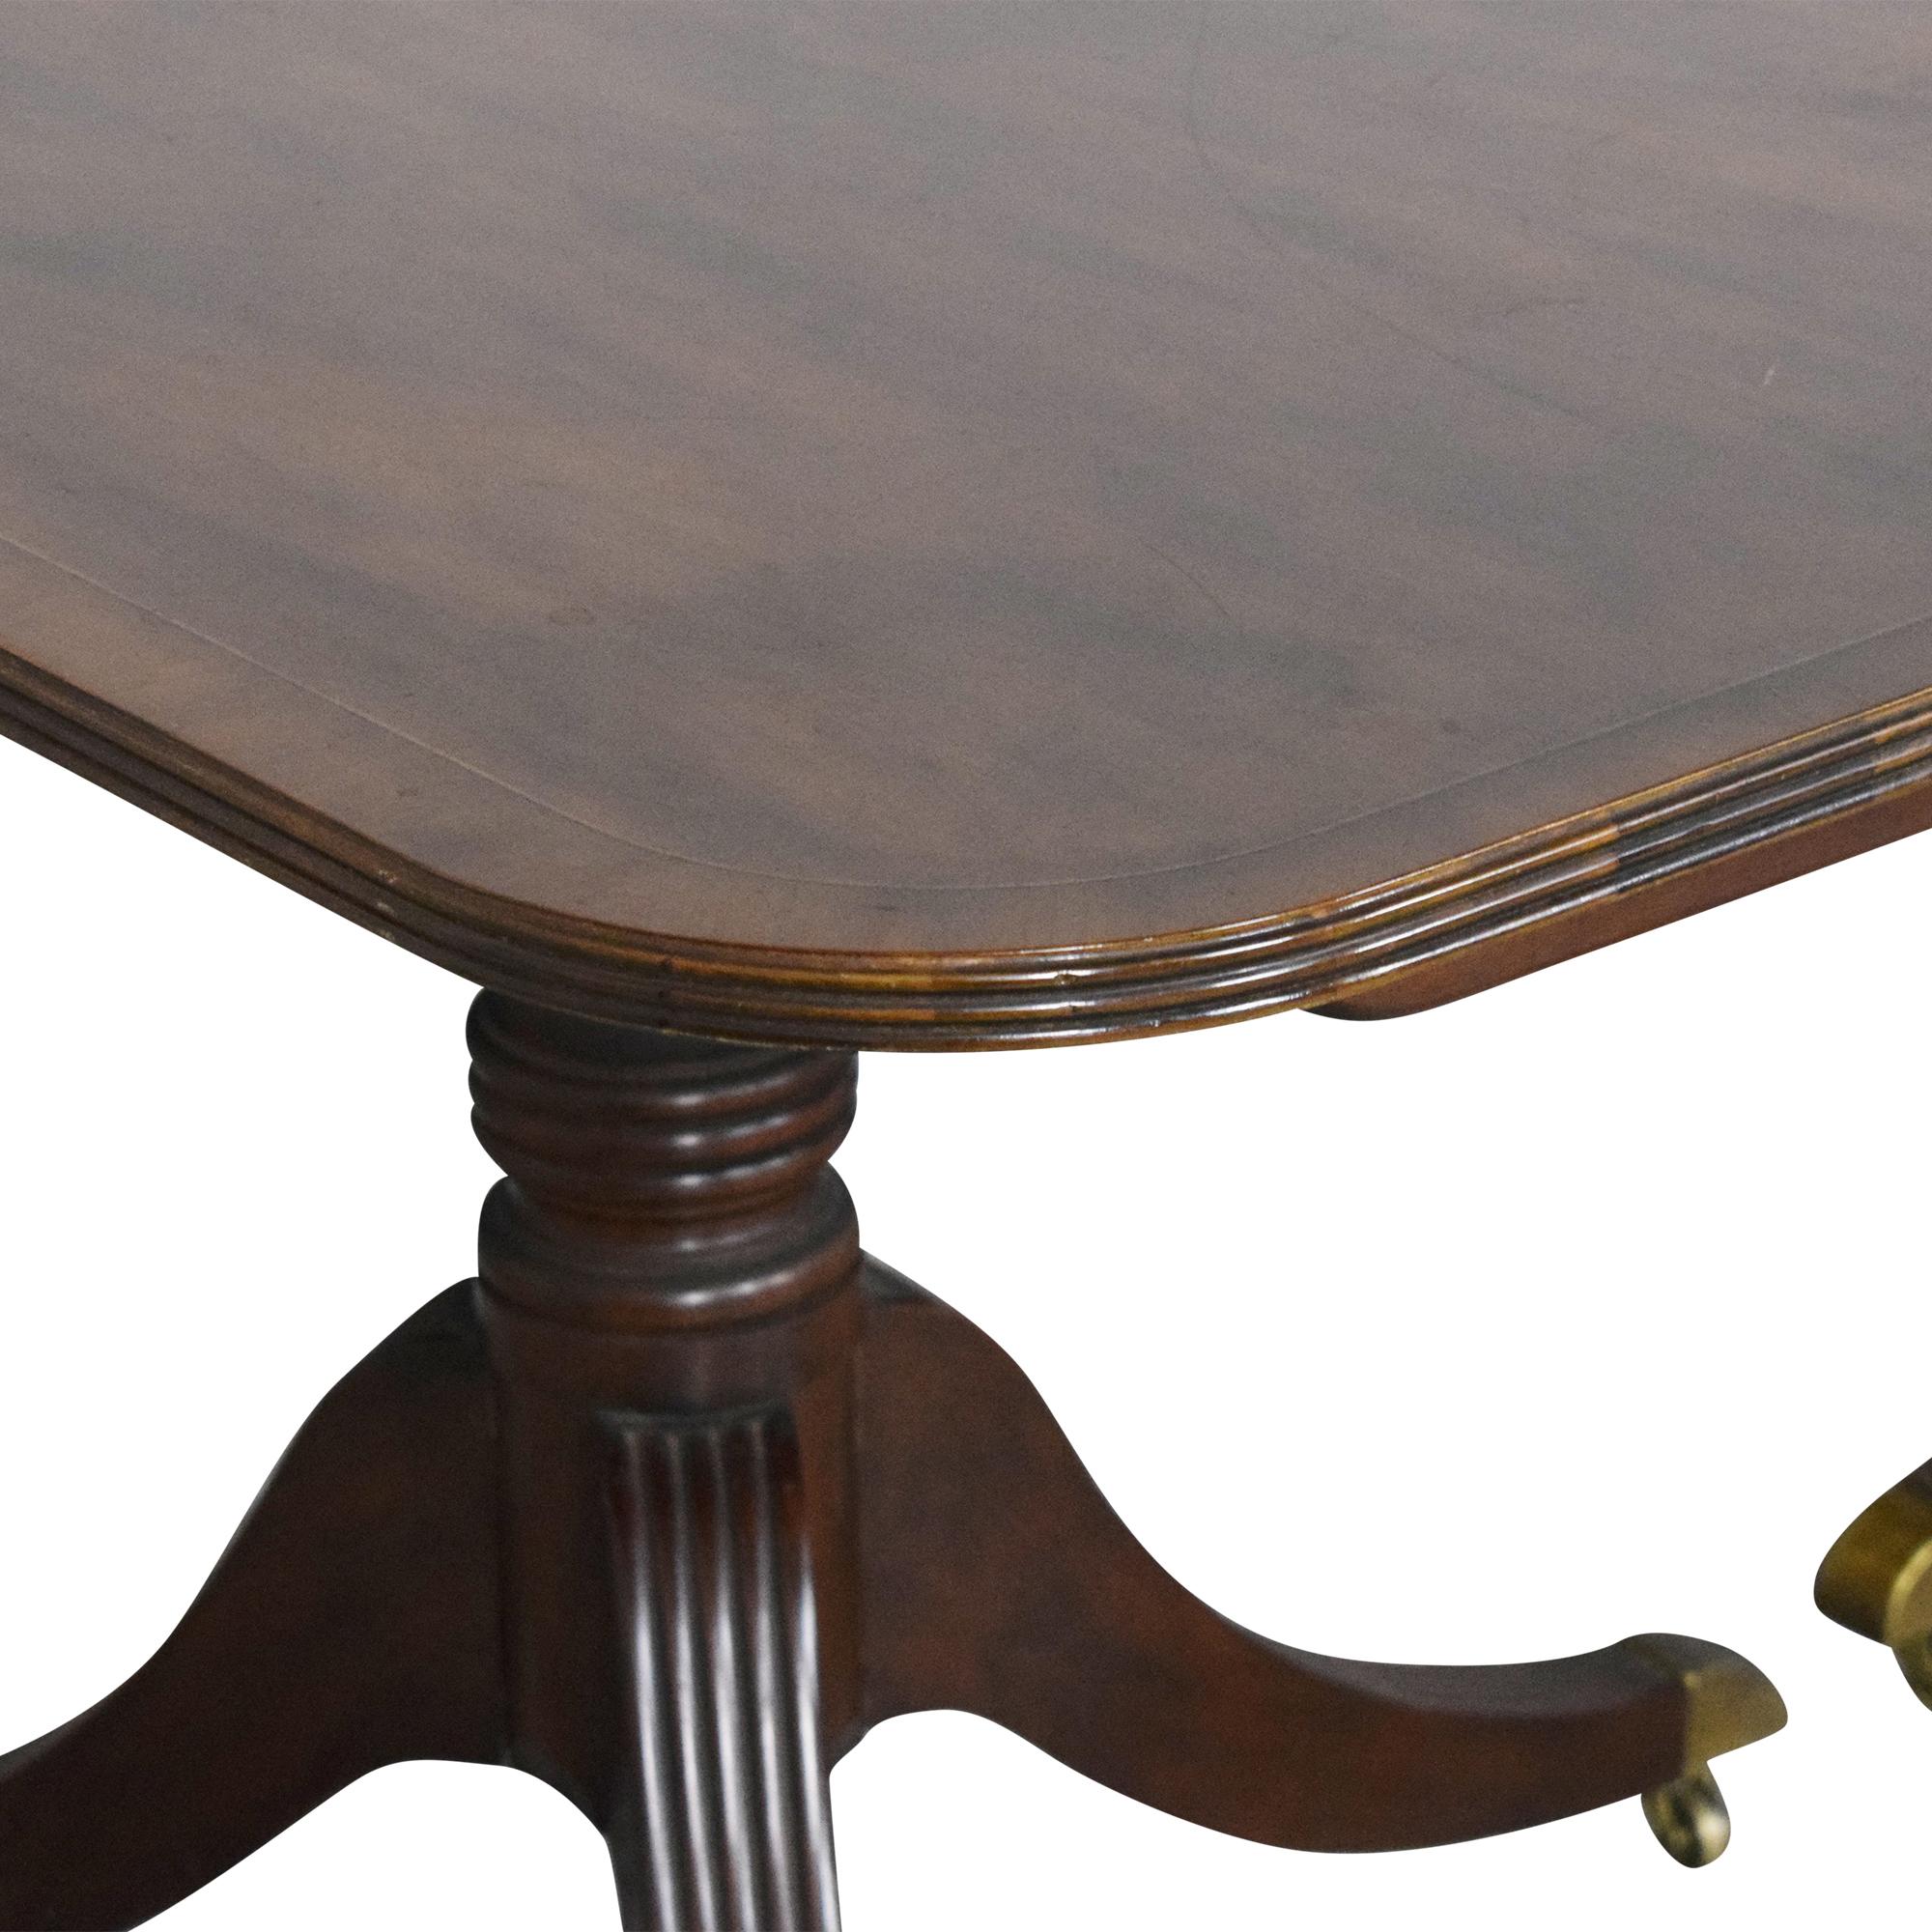 Baker Furniture Baker Furniture Extendable Double Pedestal Dining Table Tables